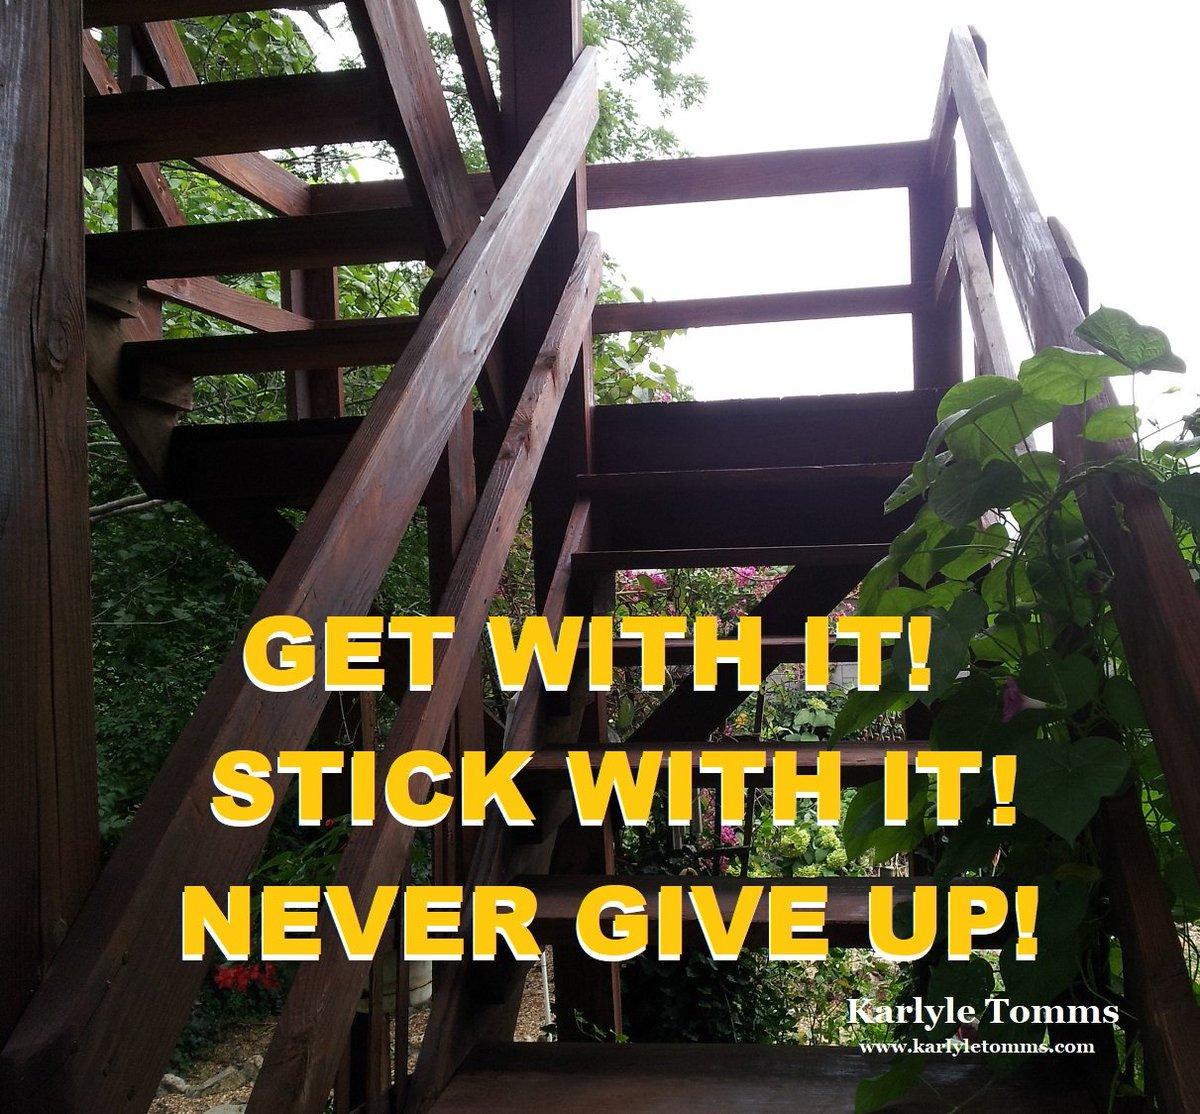 Retweets appreciated. #motivationalquotes #successquotes  http:// karlyletomms.com    <br>http://pic.twitter.com/otI8PkXmkc